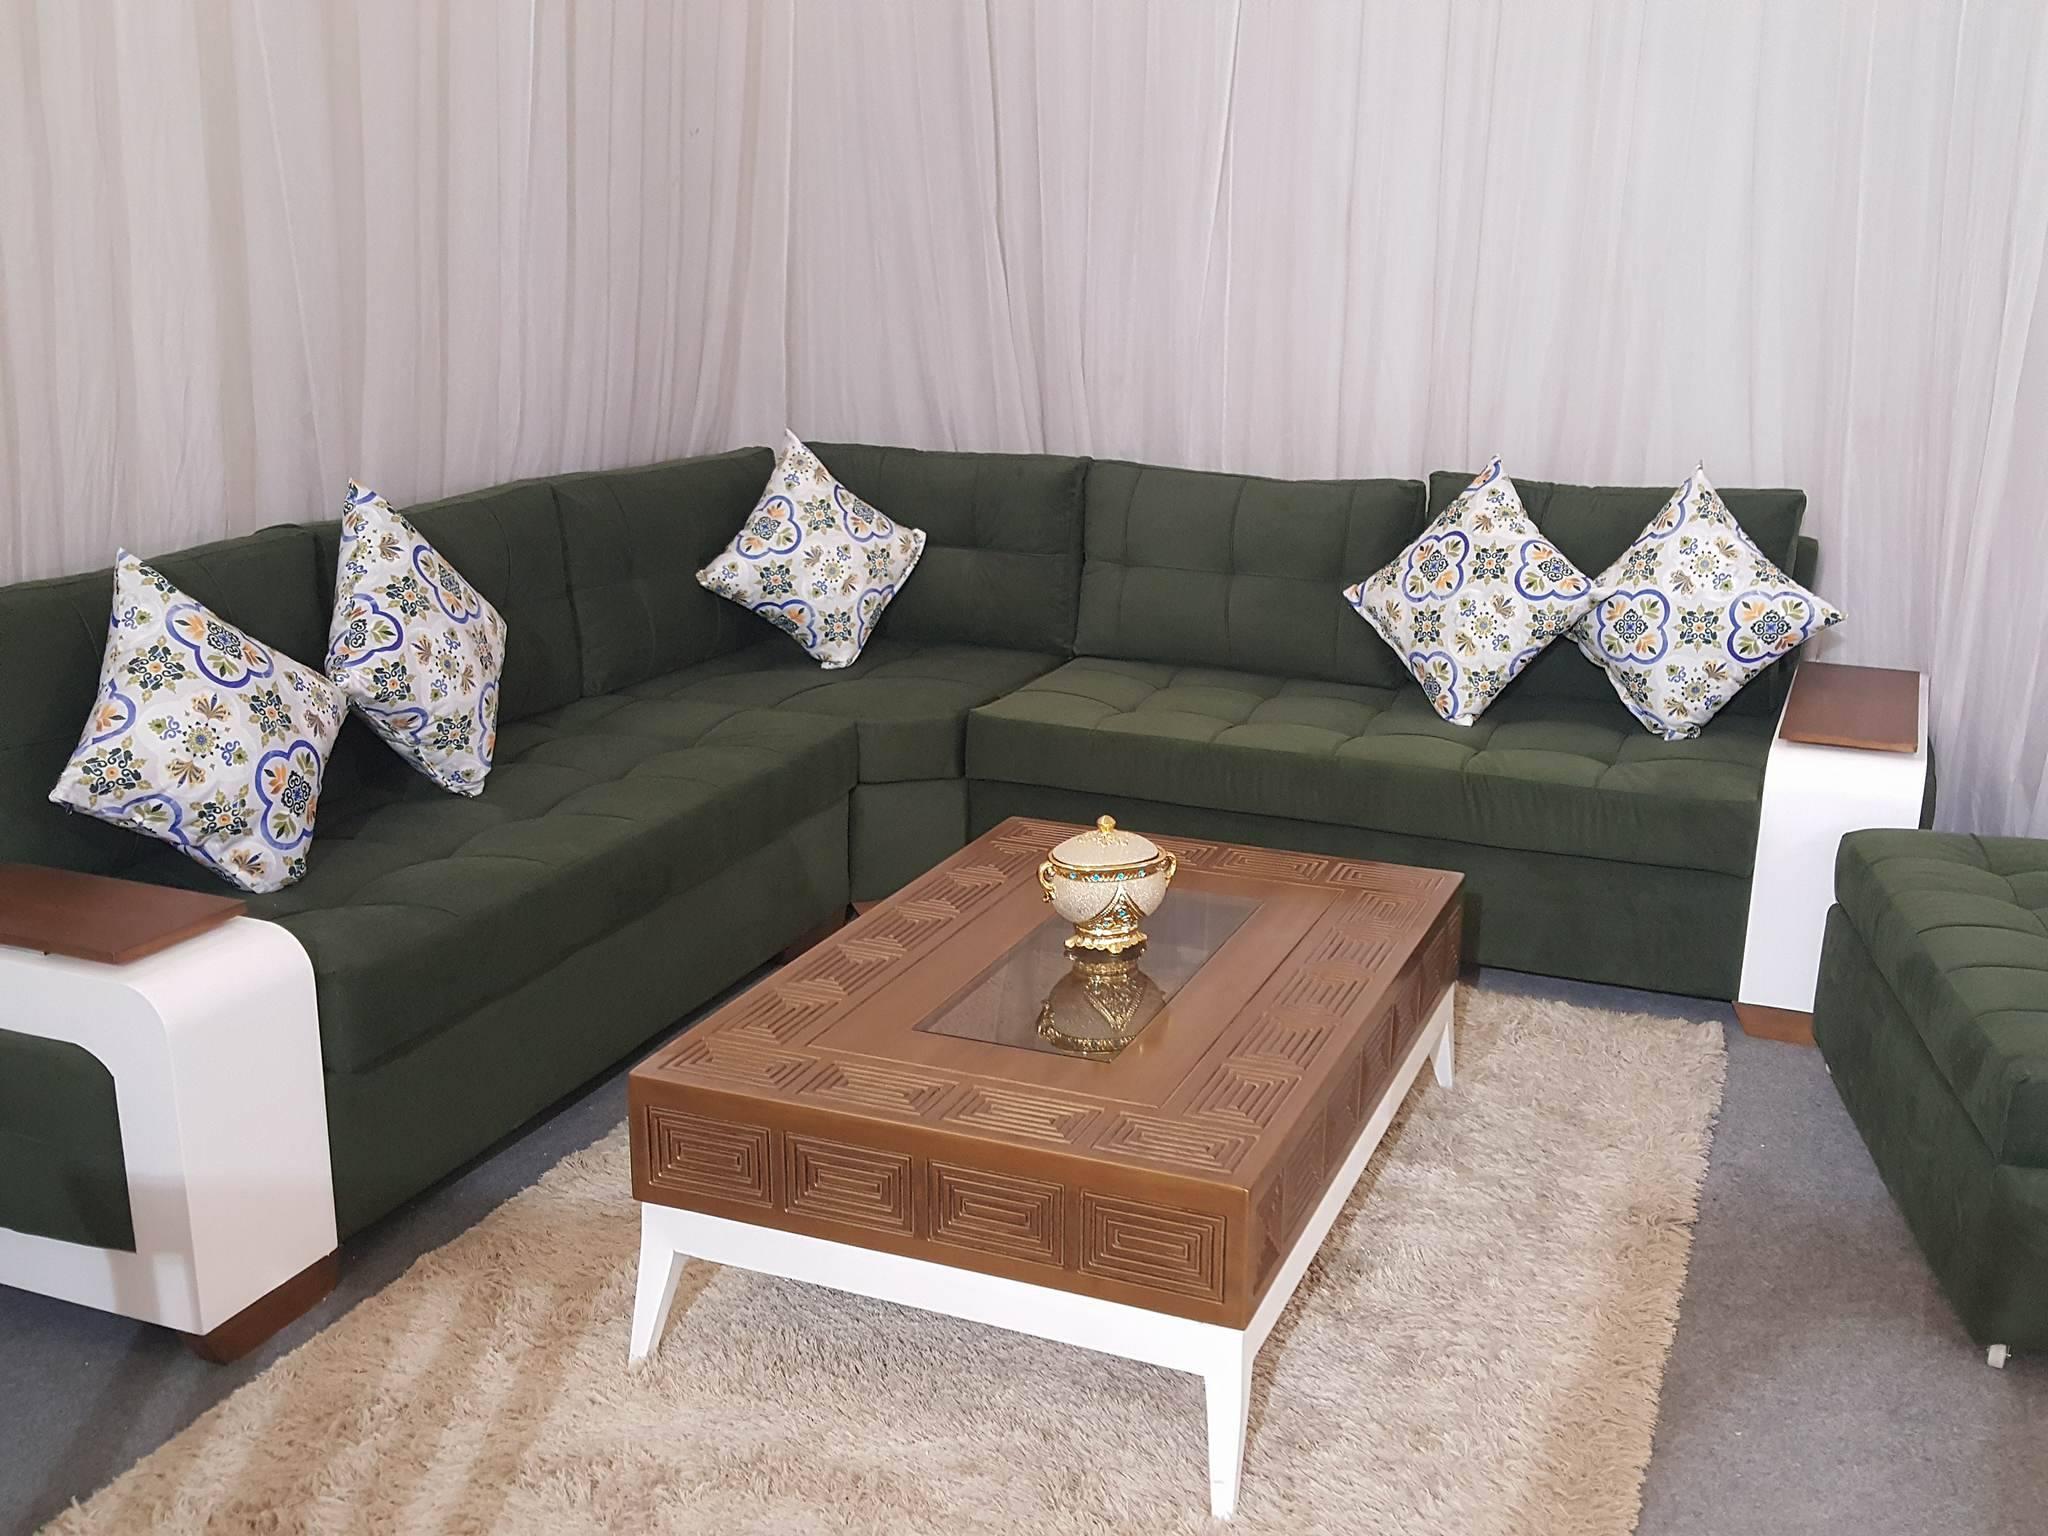 salon dhekra promo mars meubles et d coration tunisie. Black Bedroom Furniture Sets. Home Design Ideas